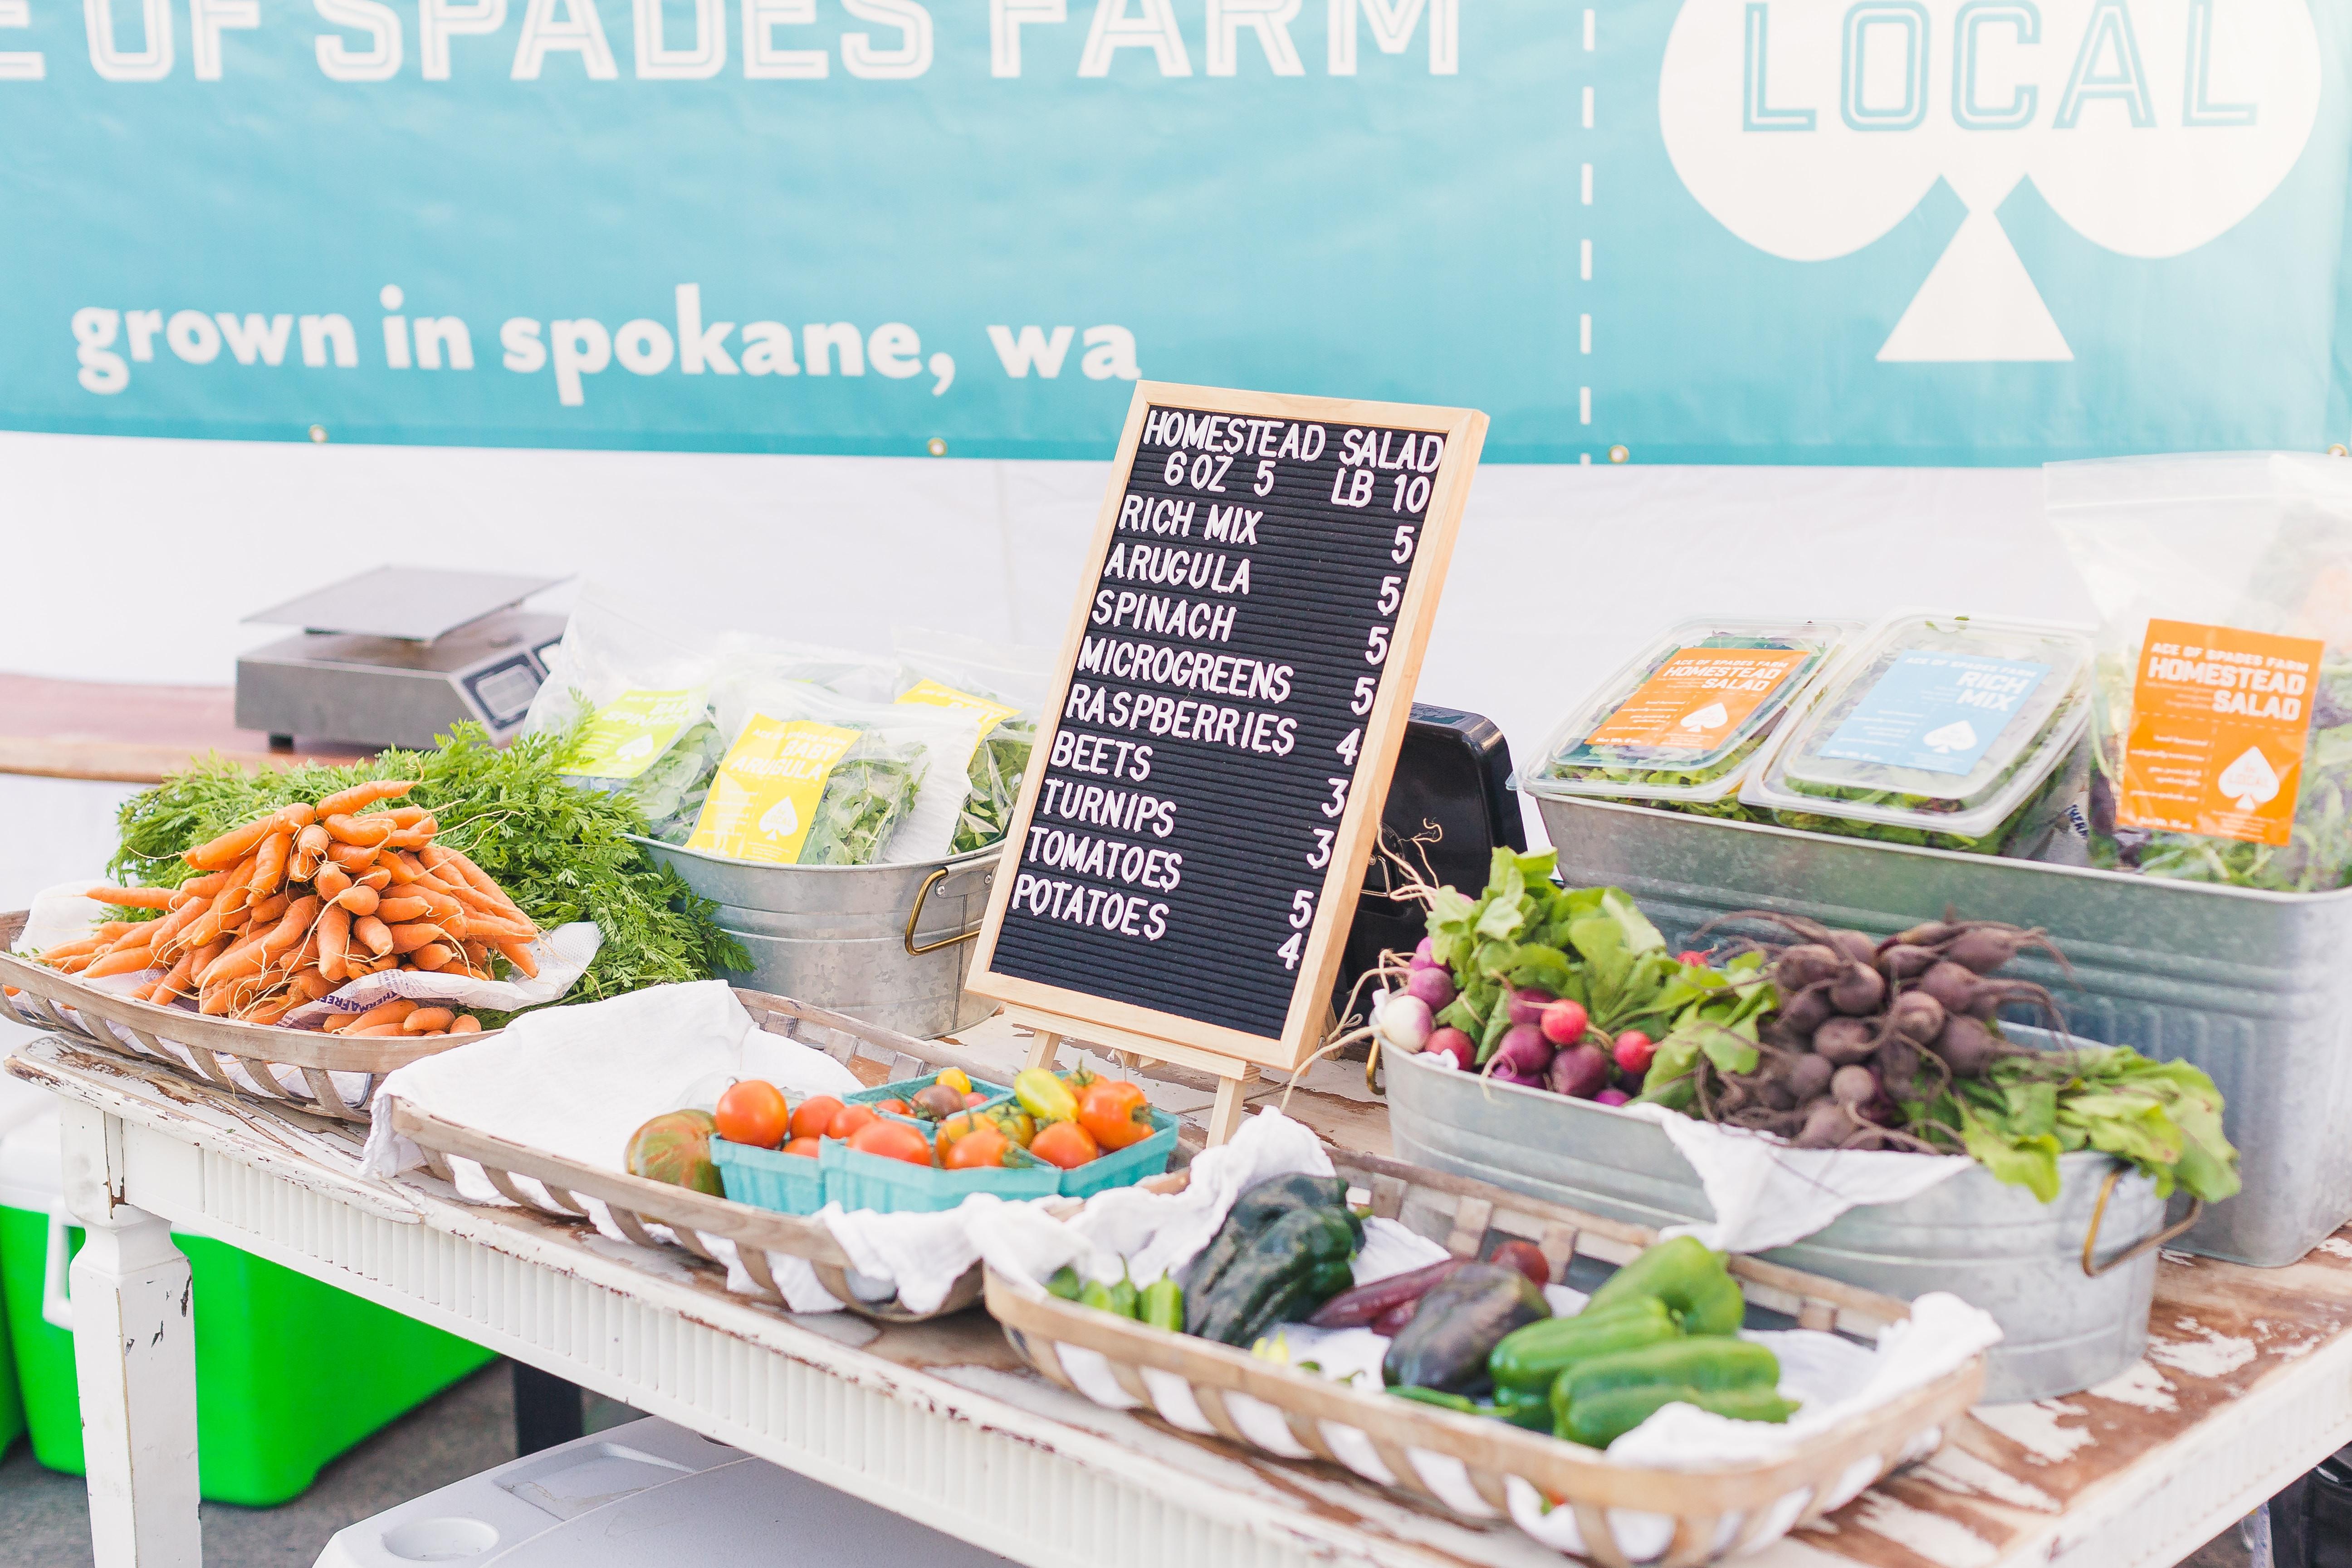 Grocery Store/ Farmer's Market Tour